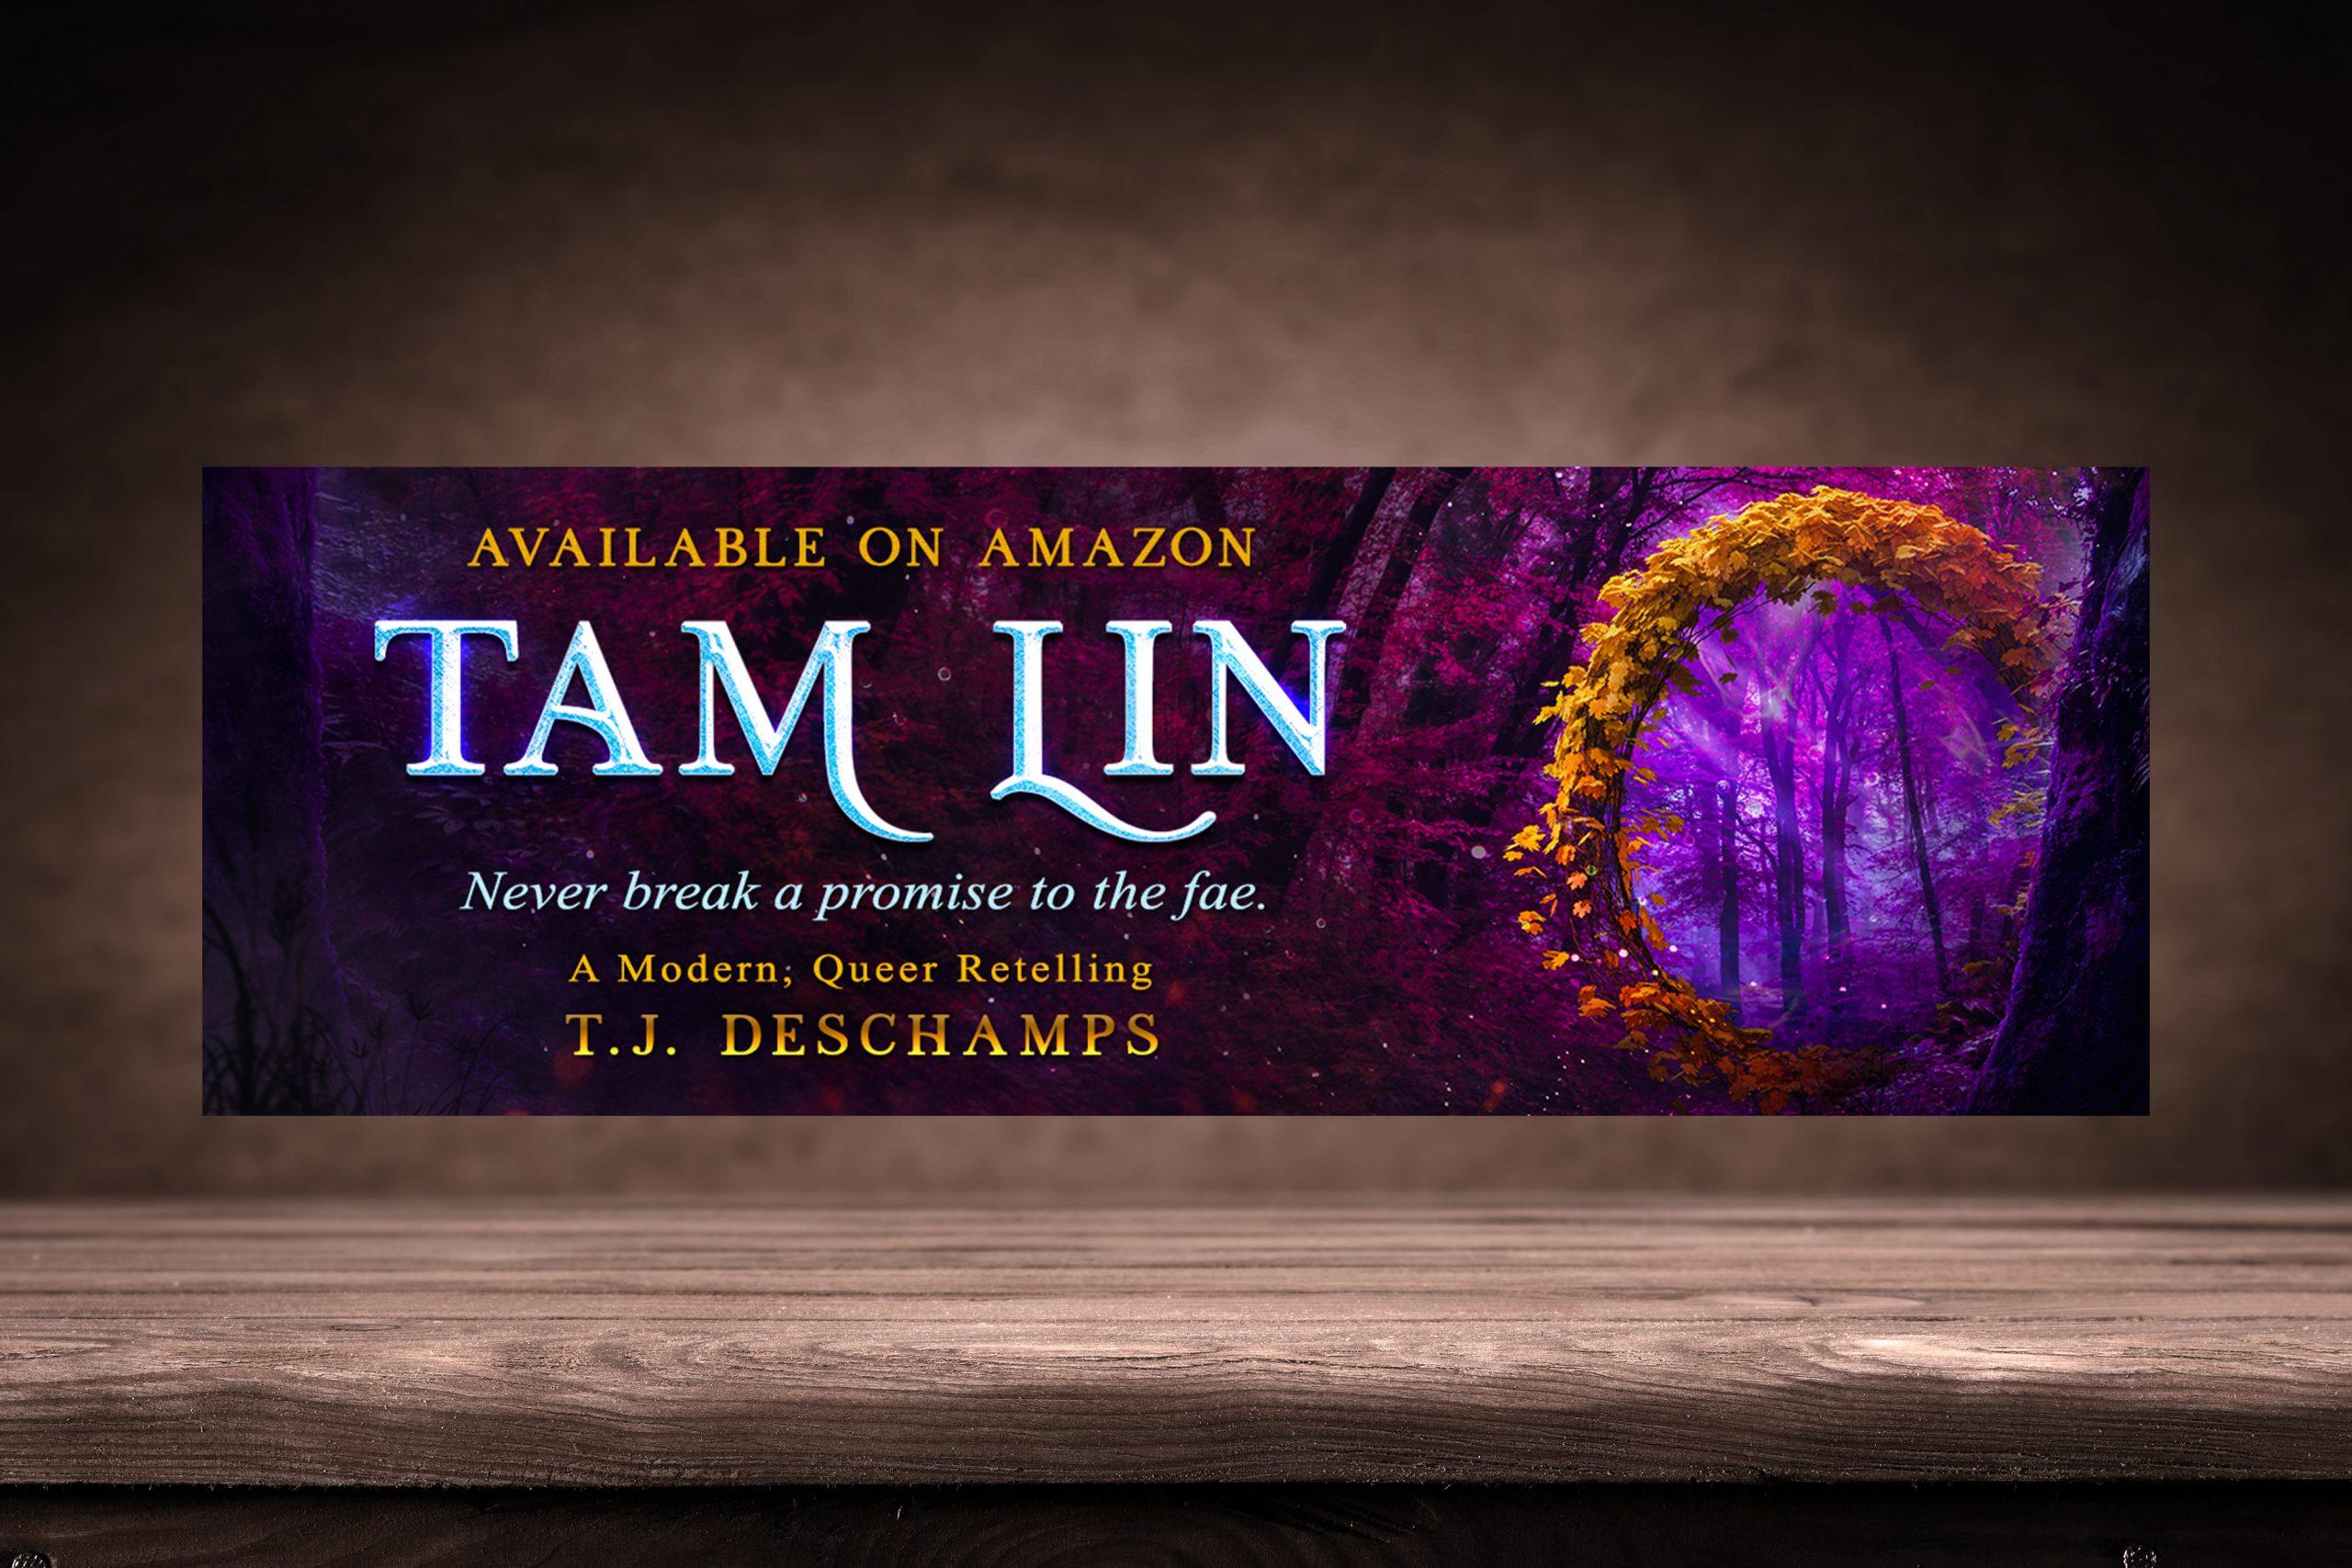 Tam Lin: A Modern, Queer Retelling (Excerpt)